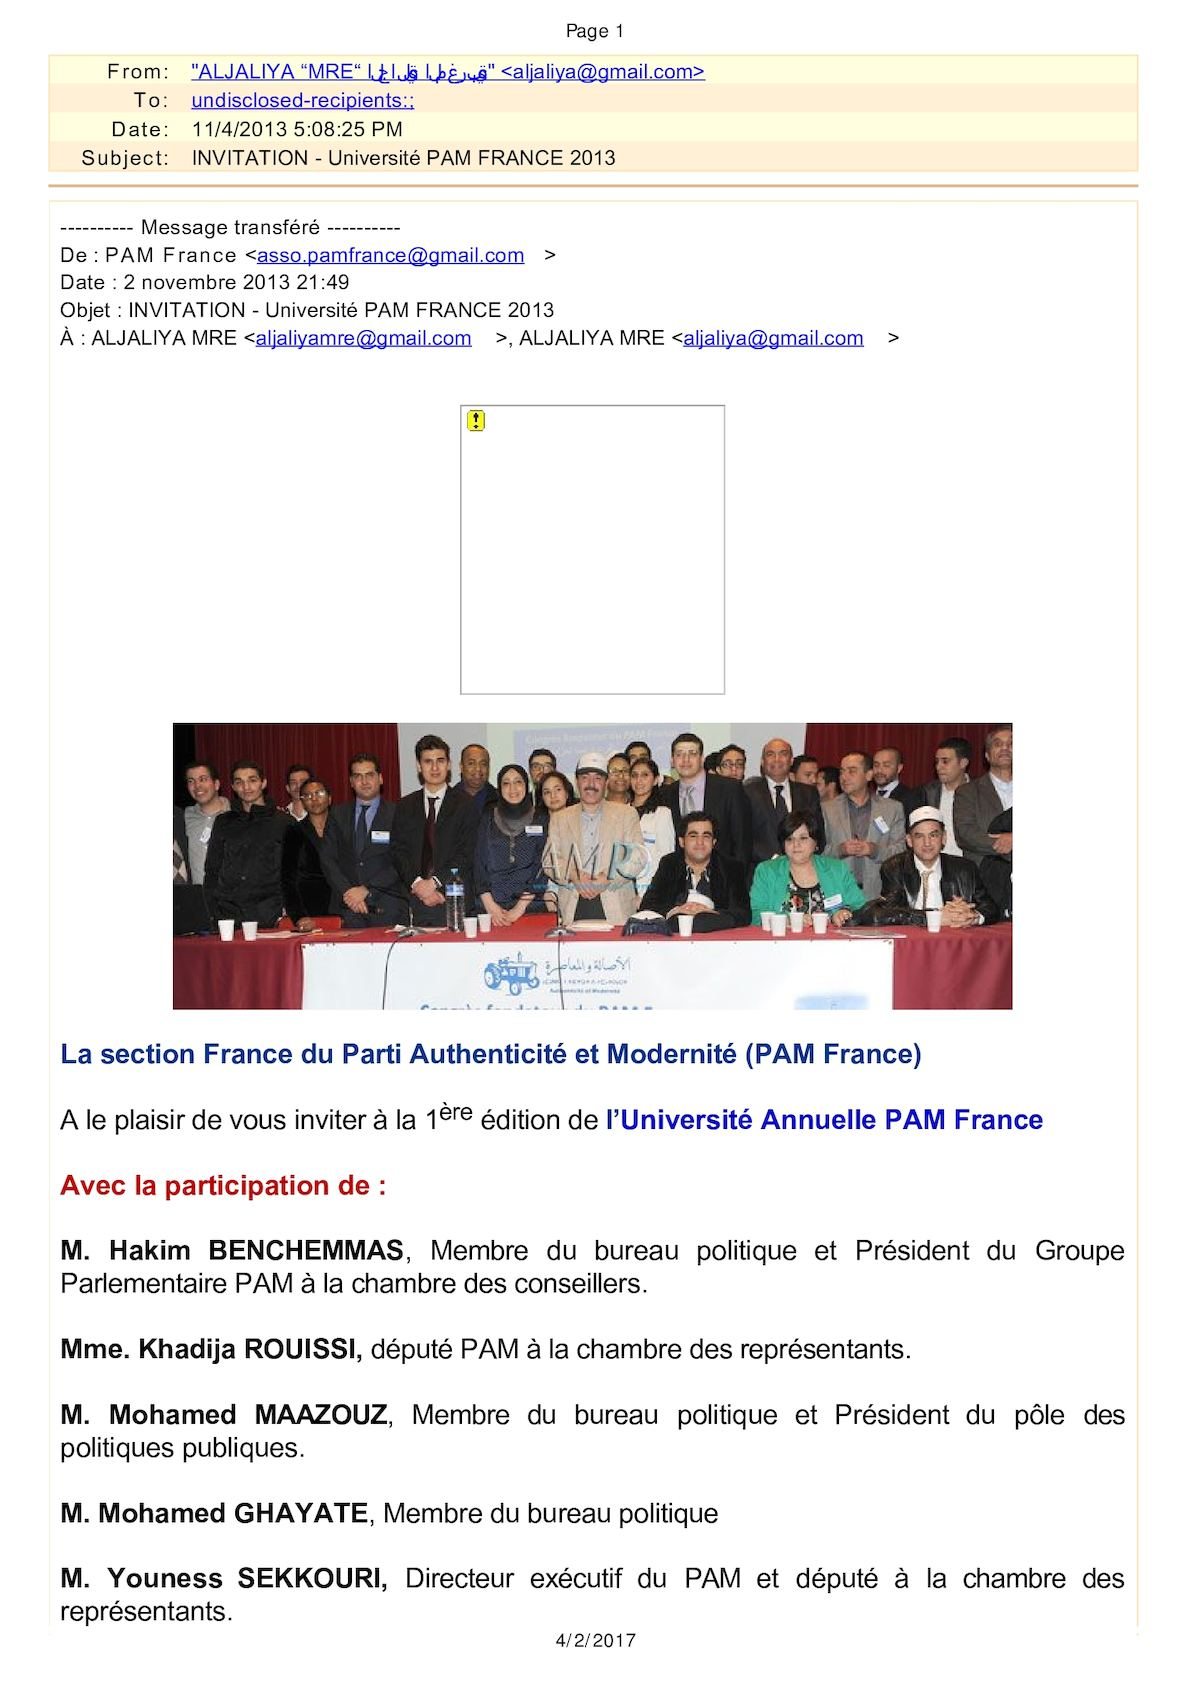 "Invitation Université Pam France 2013 Aljaliya ""Mre"" الجالية المغربية (Aljaliya@gmail Com) 2013 11 04 2308"